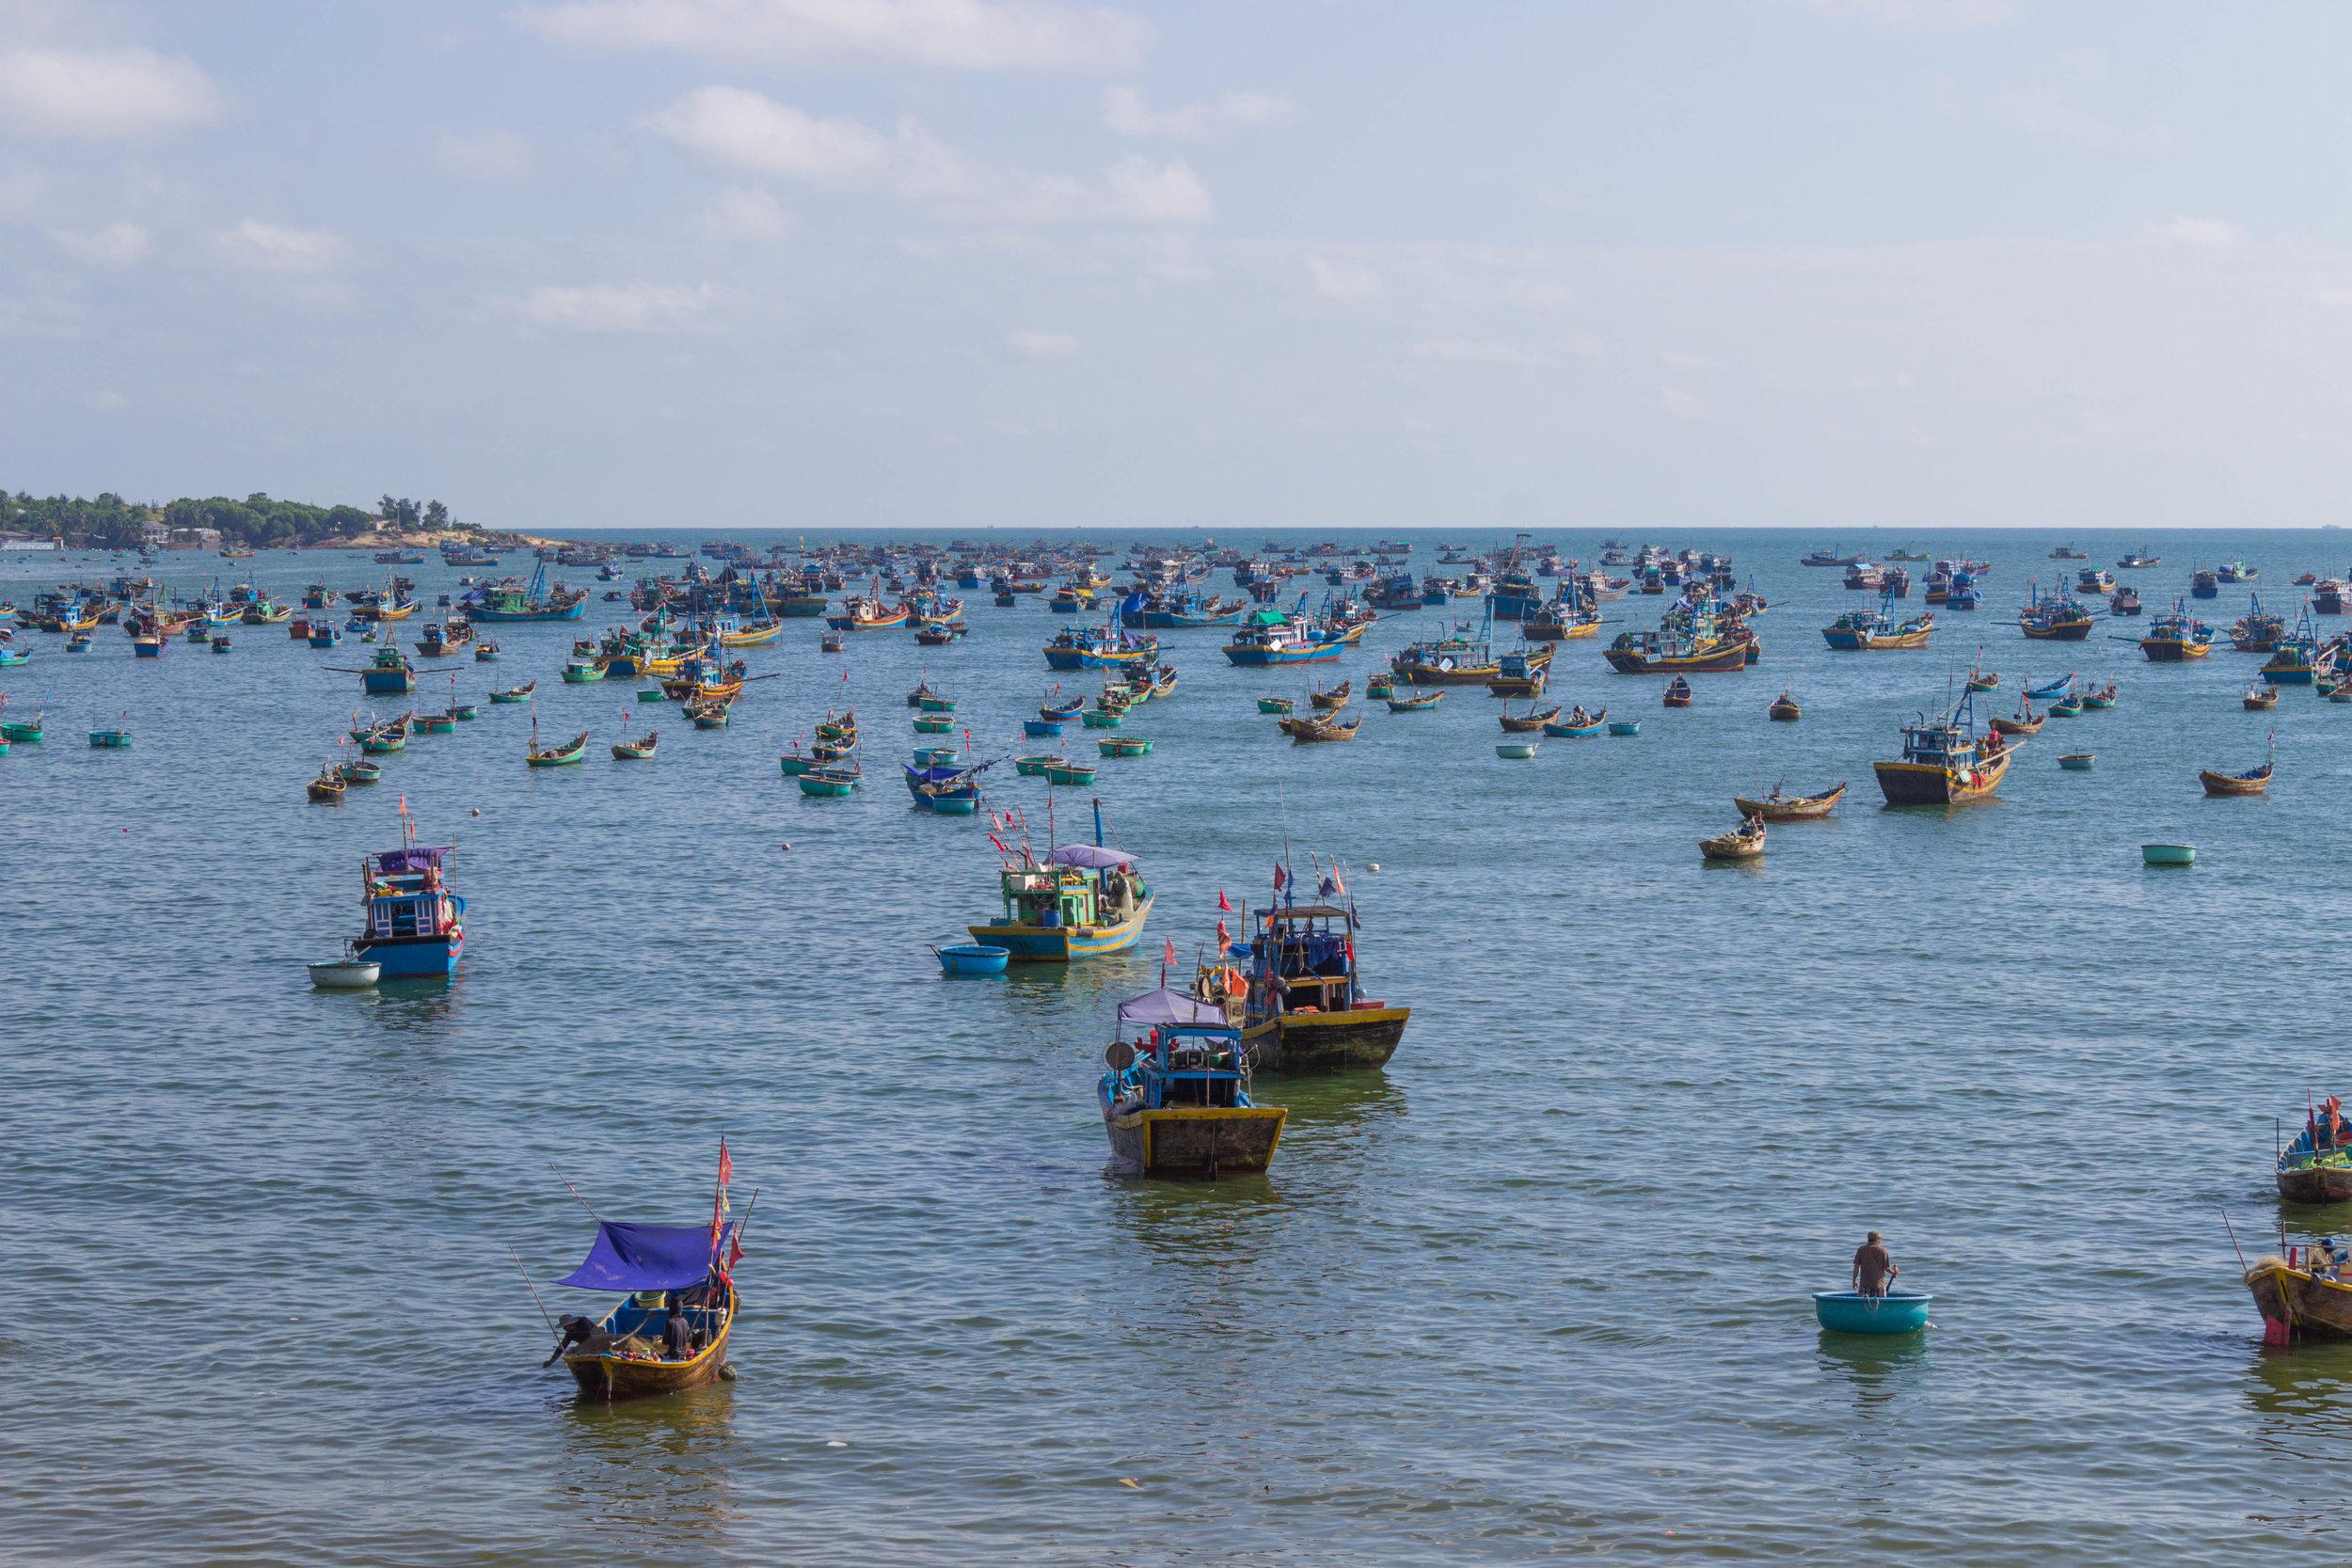 Fisherman boats in the harbor of Mui Ne